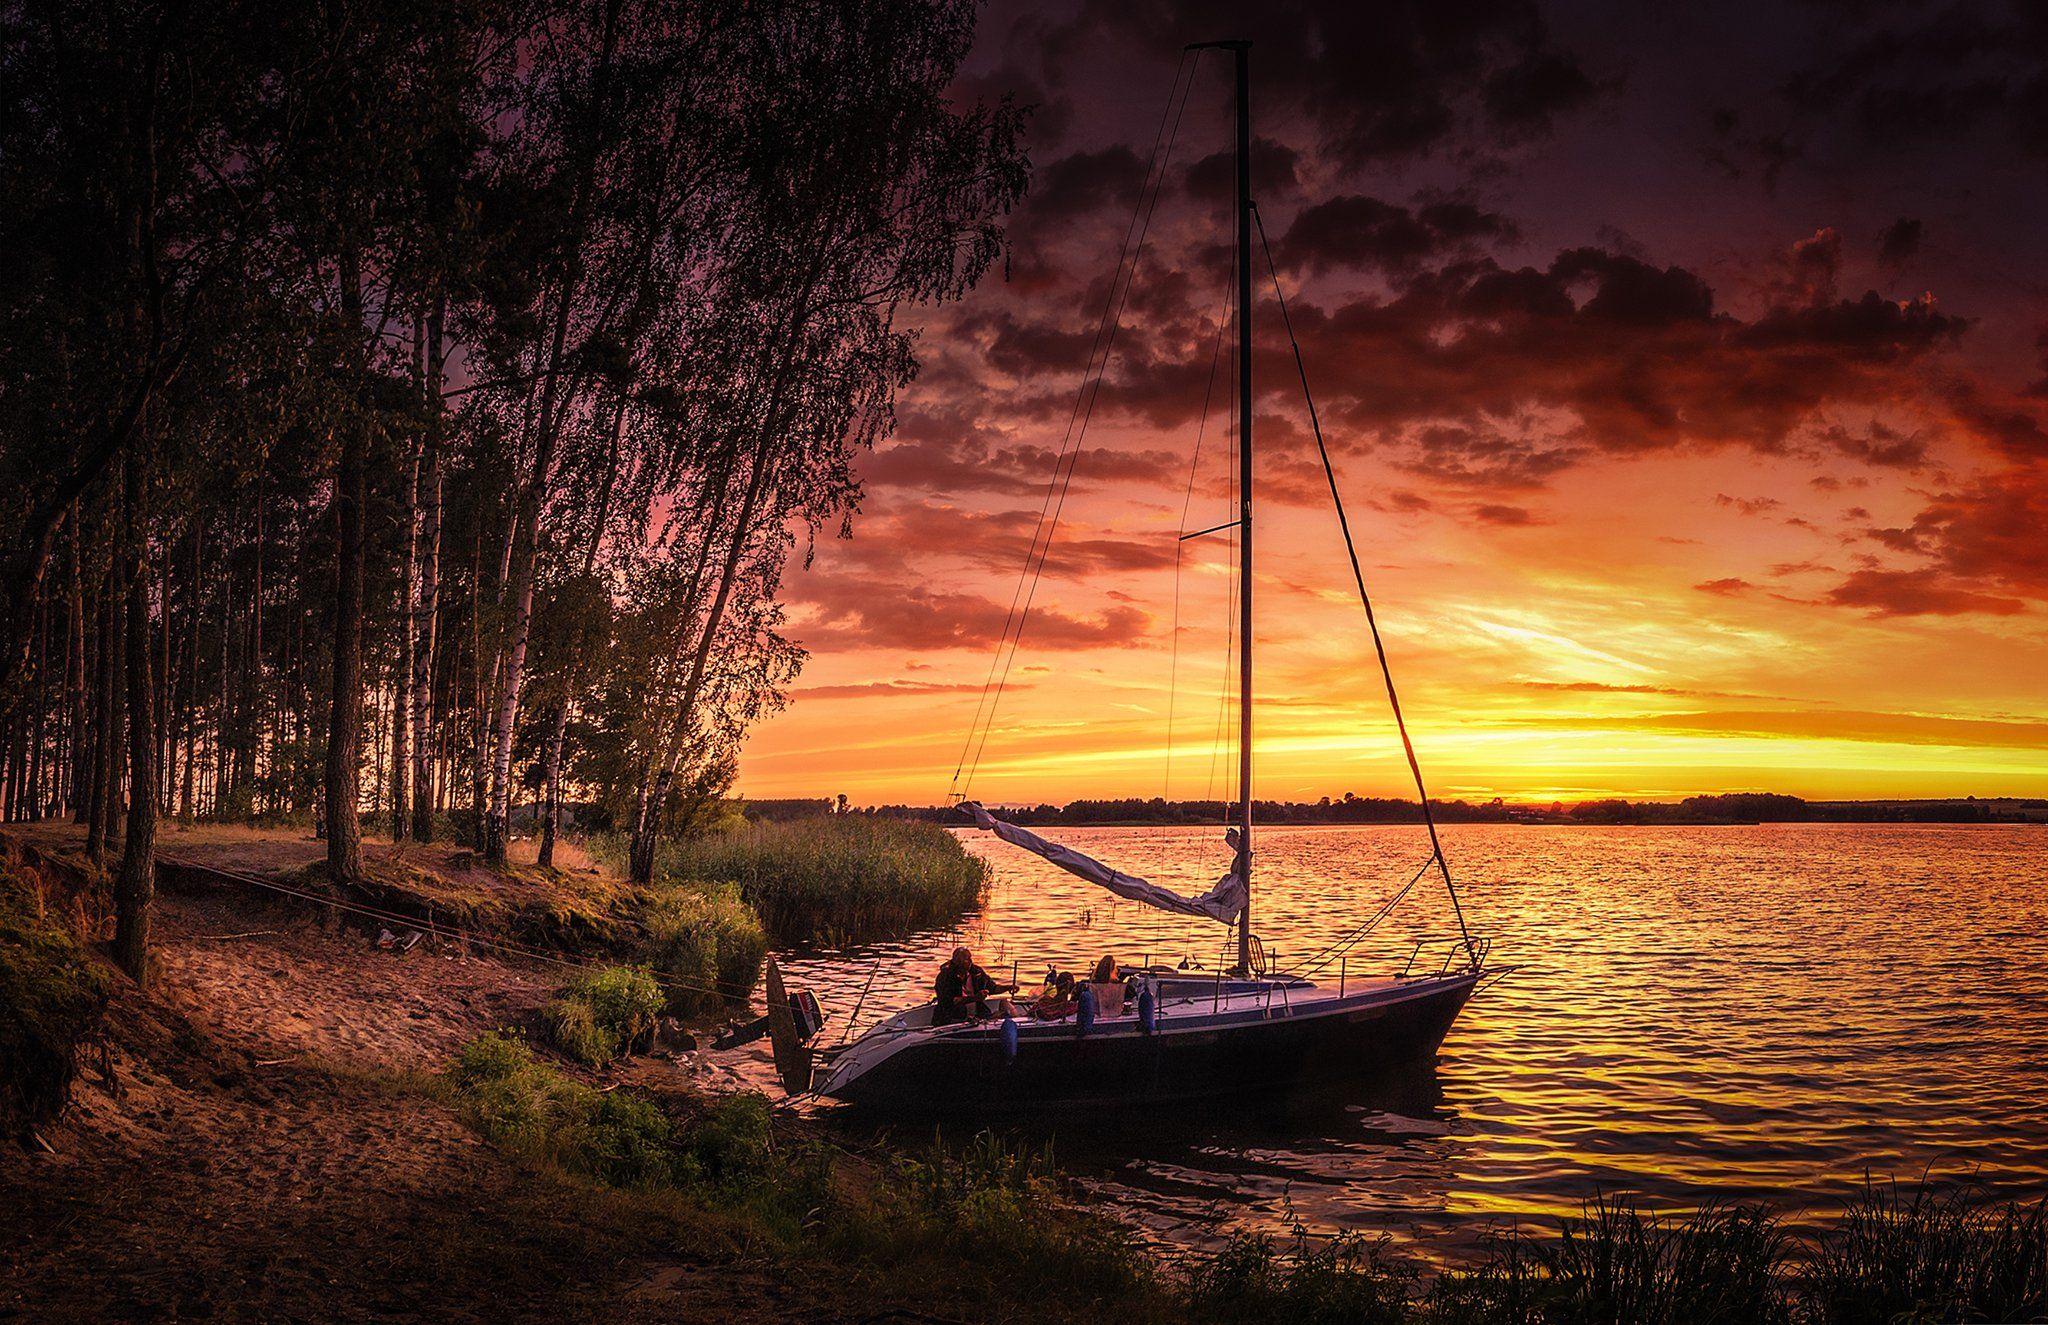 nature, sun, sky, lake, sunset, boat, tree, Olejniczak Paweł